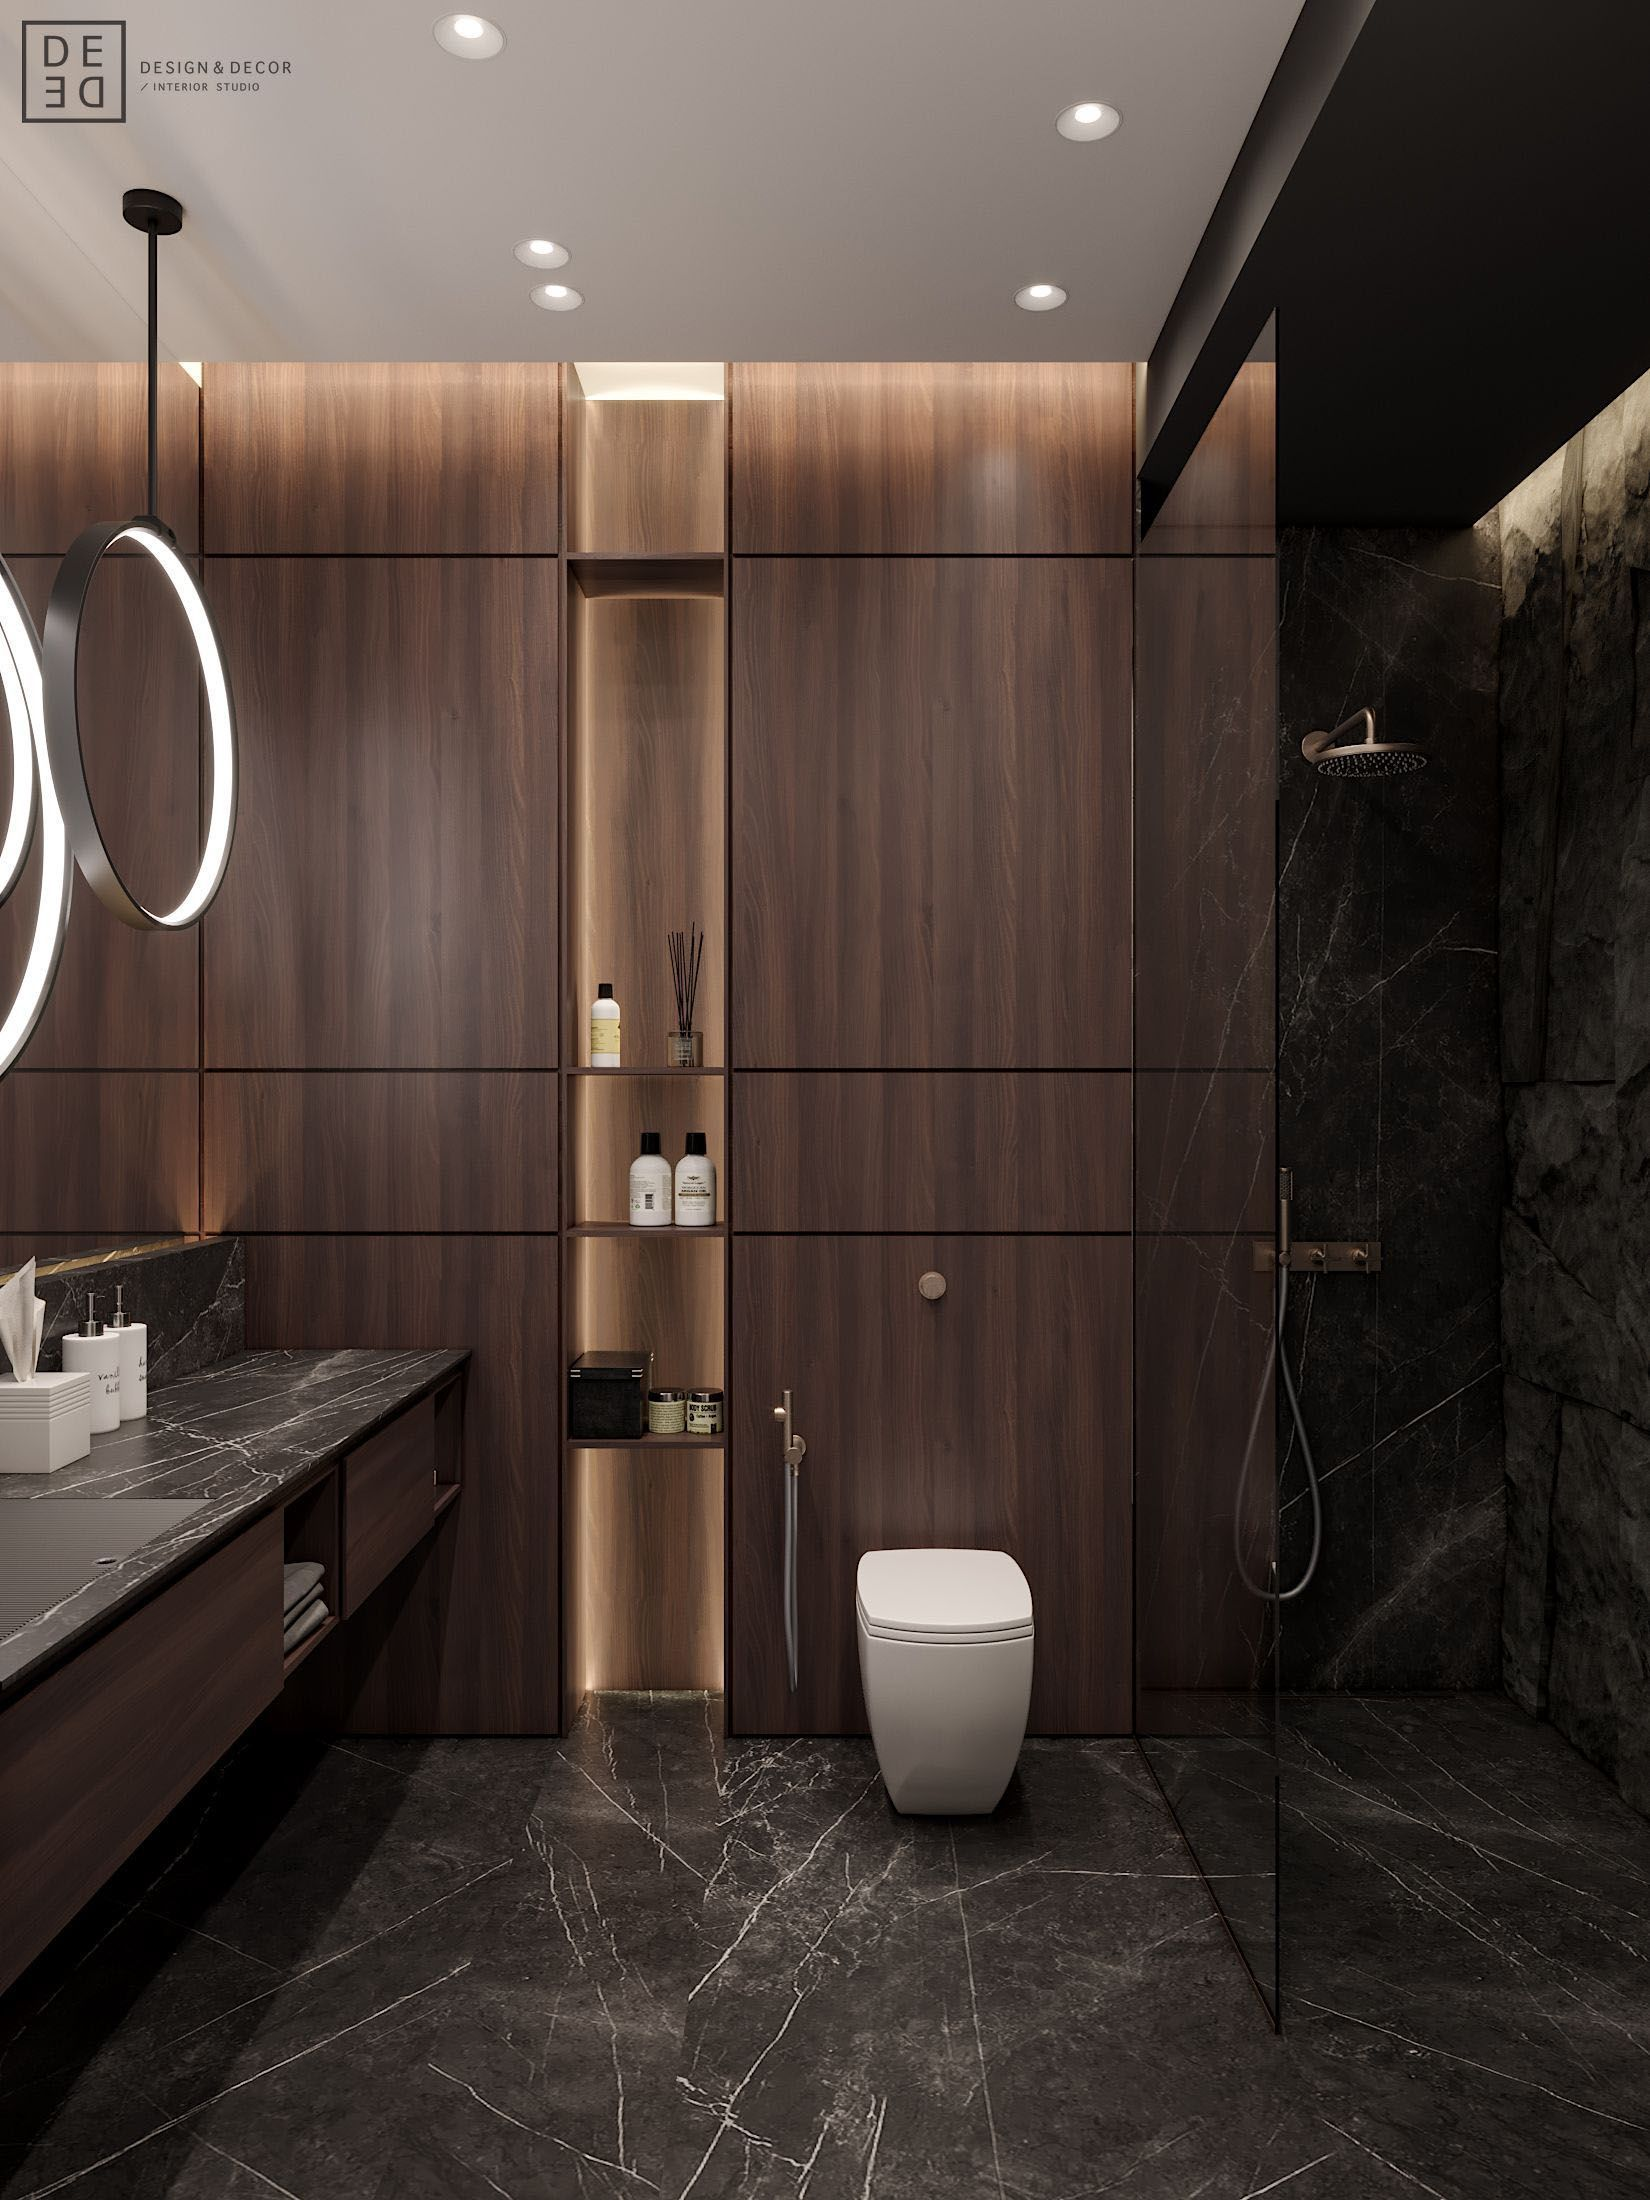 44 Perfect Master Bathroom Design Ideas For Small Spaces ... on Nice Bathroom Designs For Small Spaces  id=42427